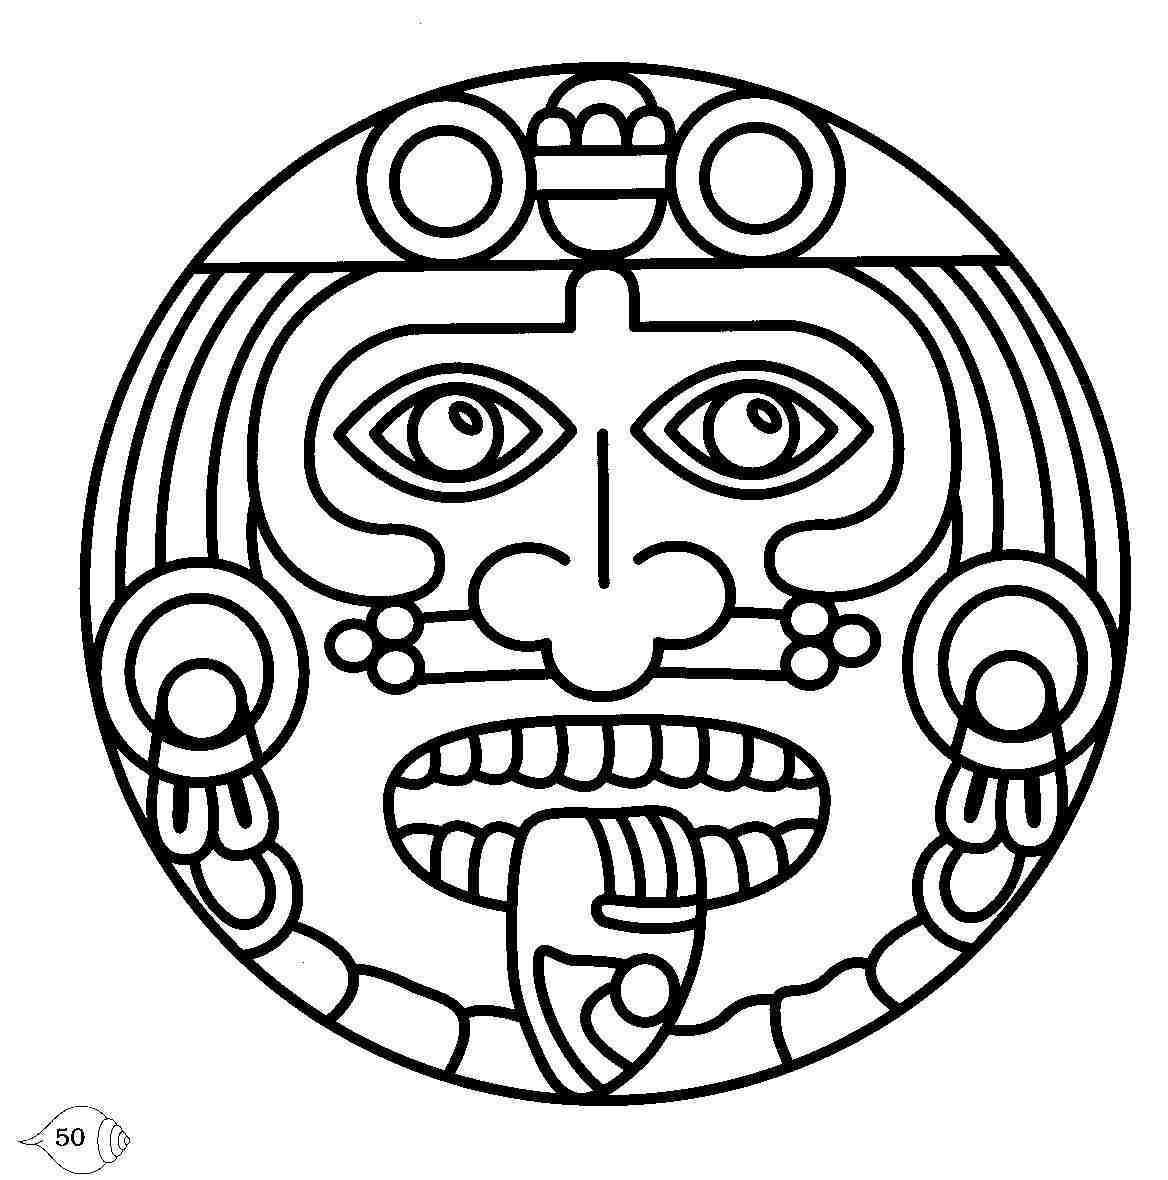 1168x1180 Mayan Symbols Mayan Circle Symbols Mayan Symbols